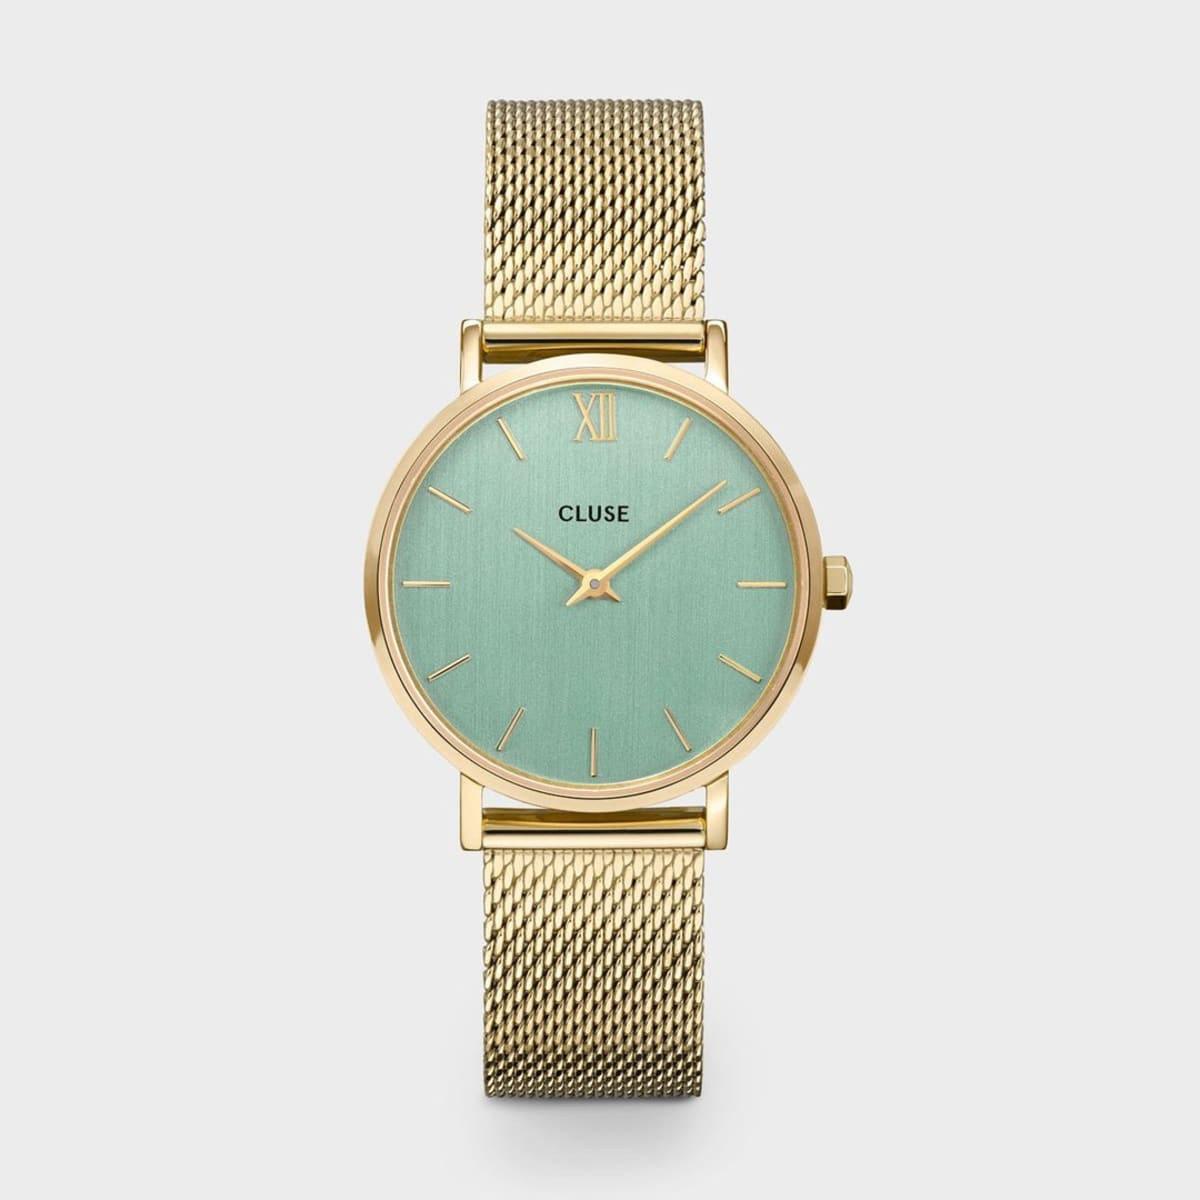 cluse-minuit-mesh-gold-stone-green-gold-cw0101203030-n-i-karora_bbf54d9d880ec000ad213b082a2426eb.jpg